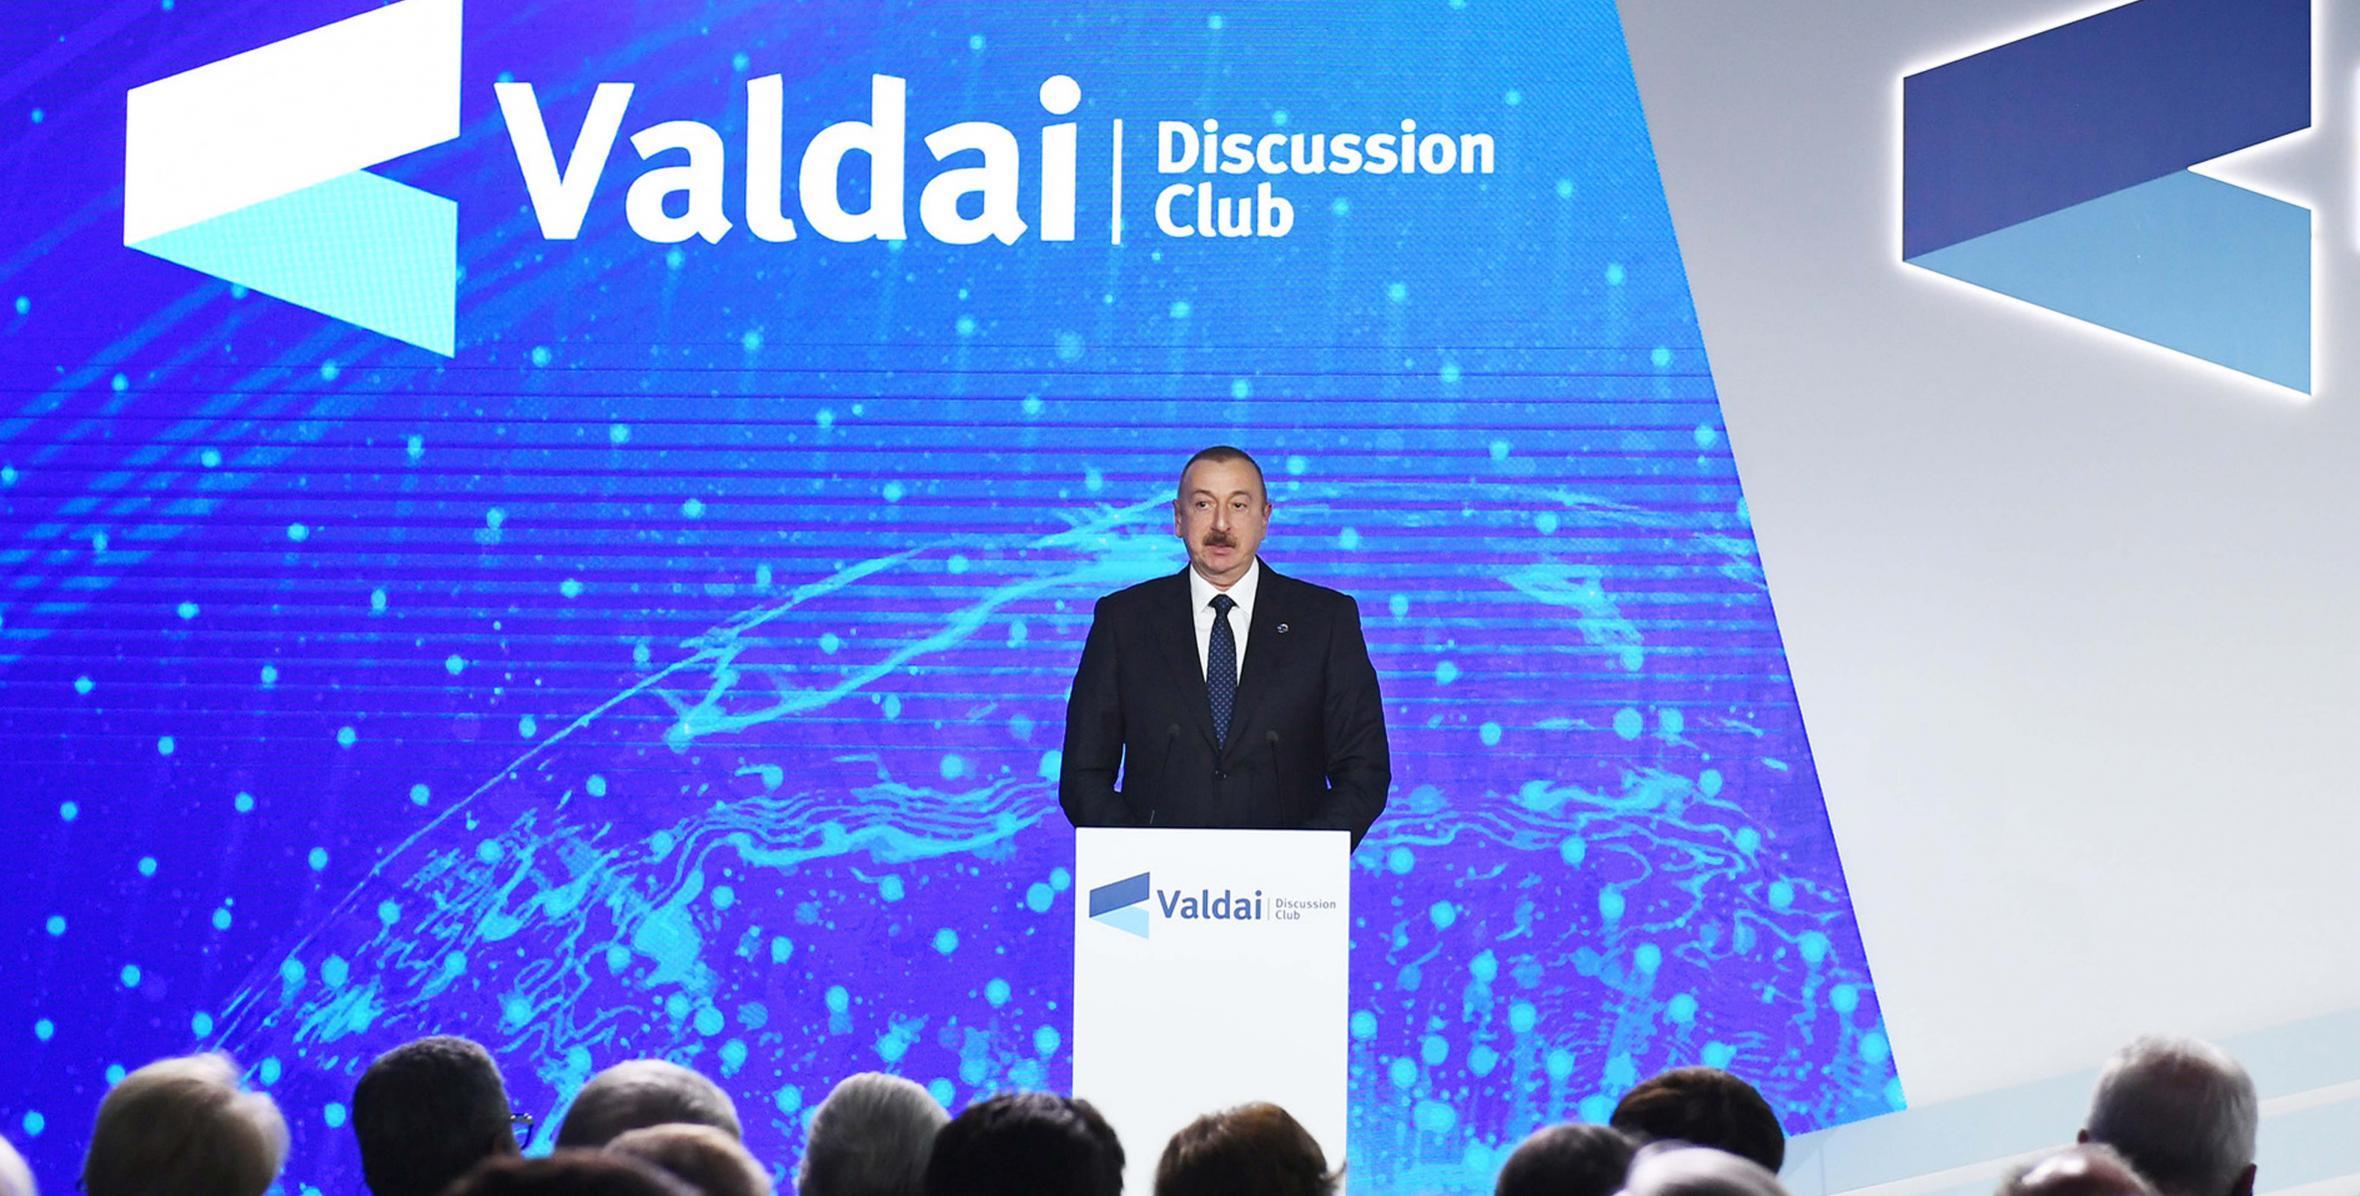 "İlham Əliyevin ""Valday"" forumunda dediyi kimi ile ilgili görsel sonucu"